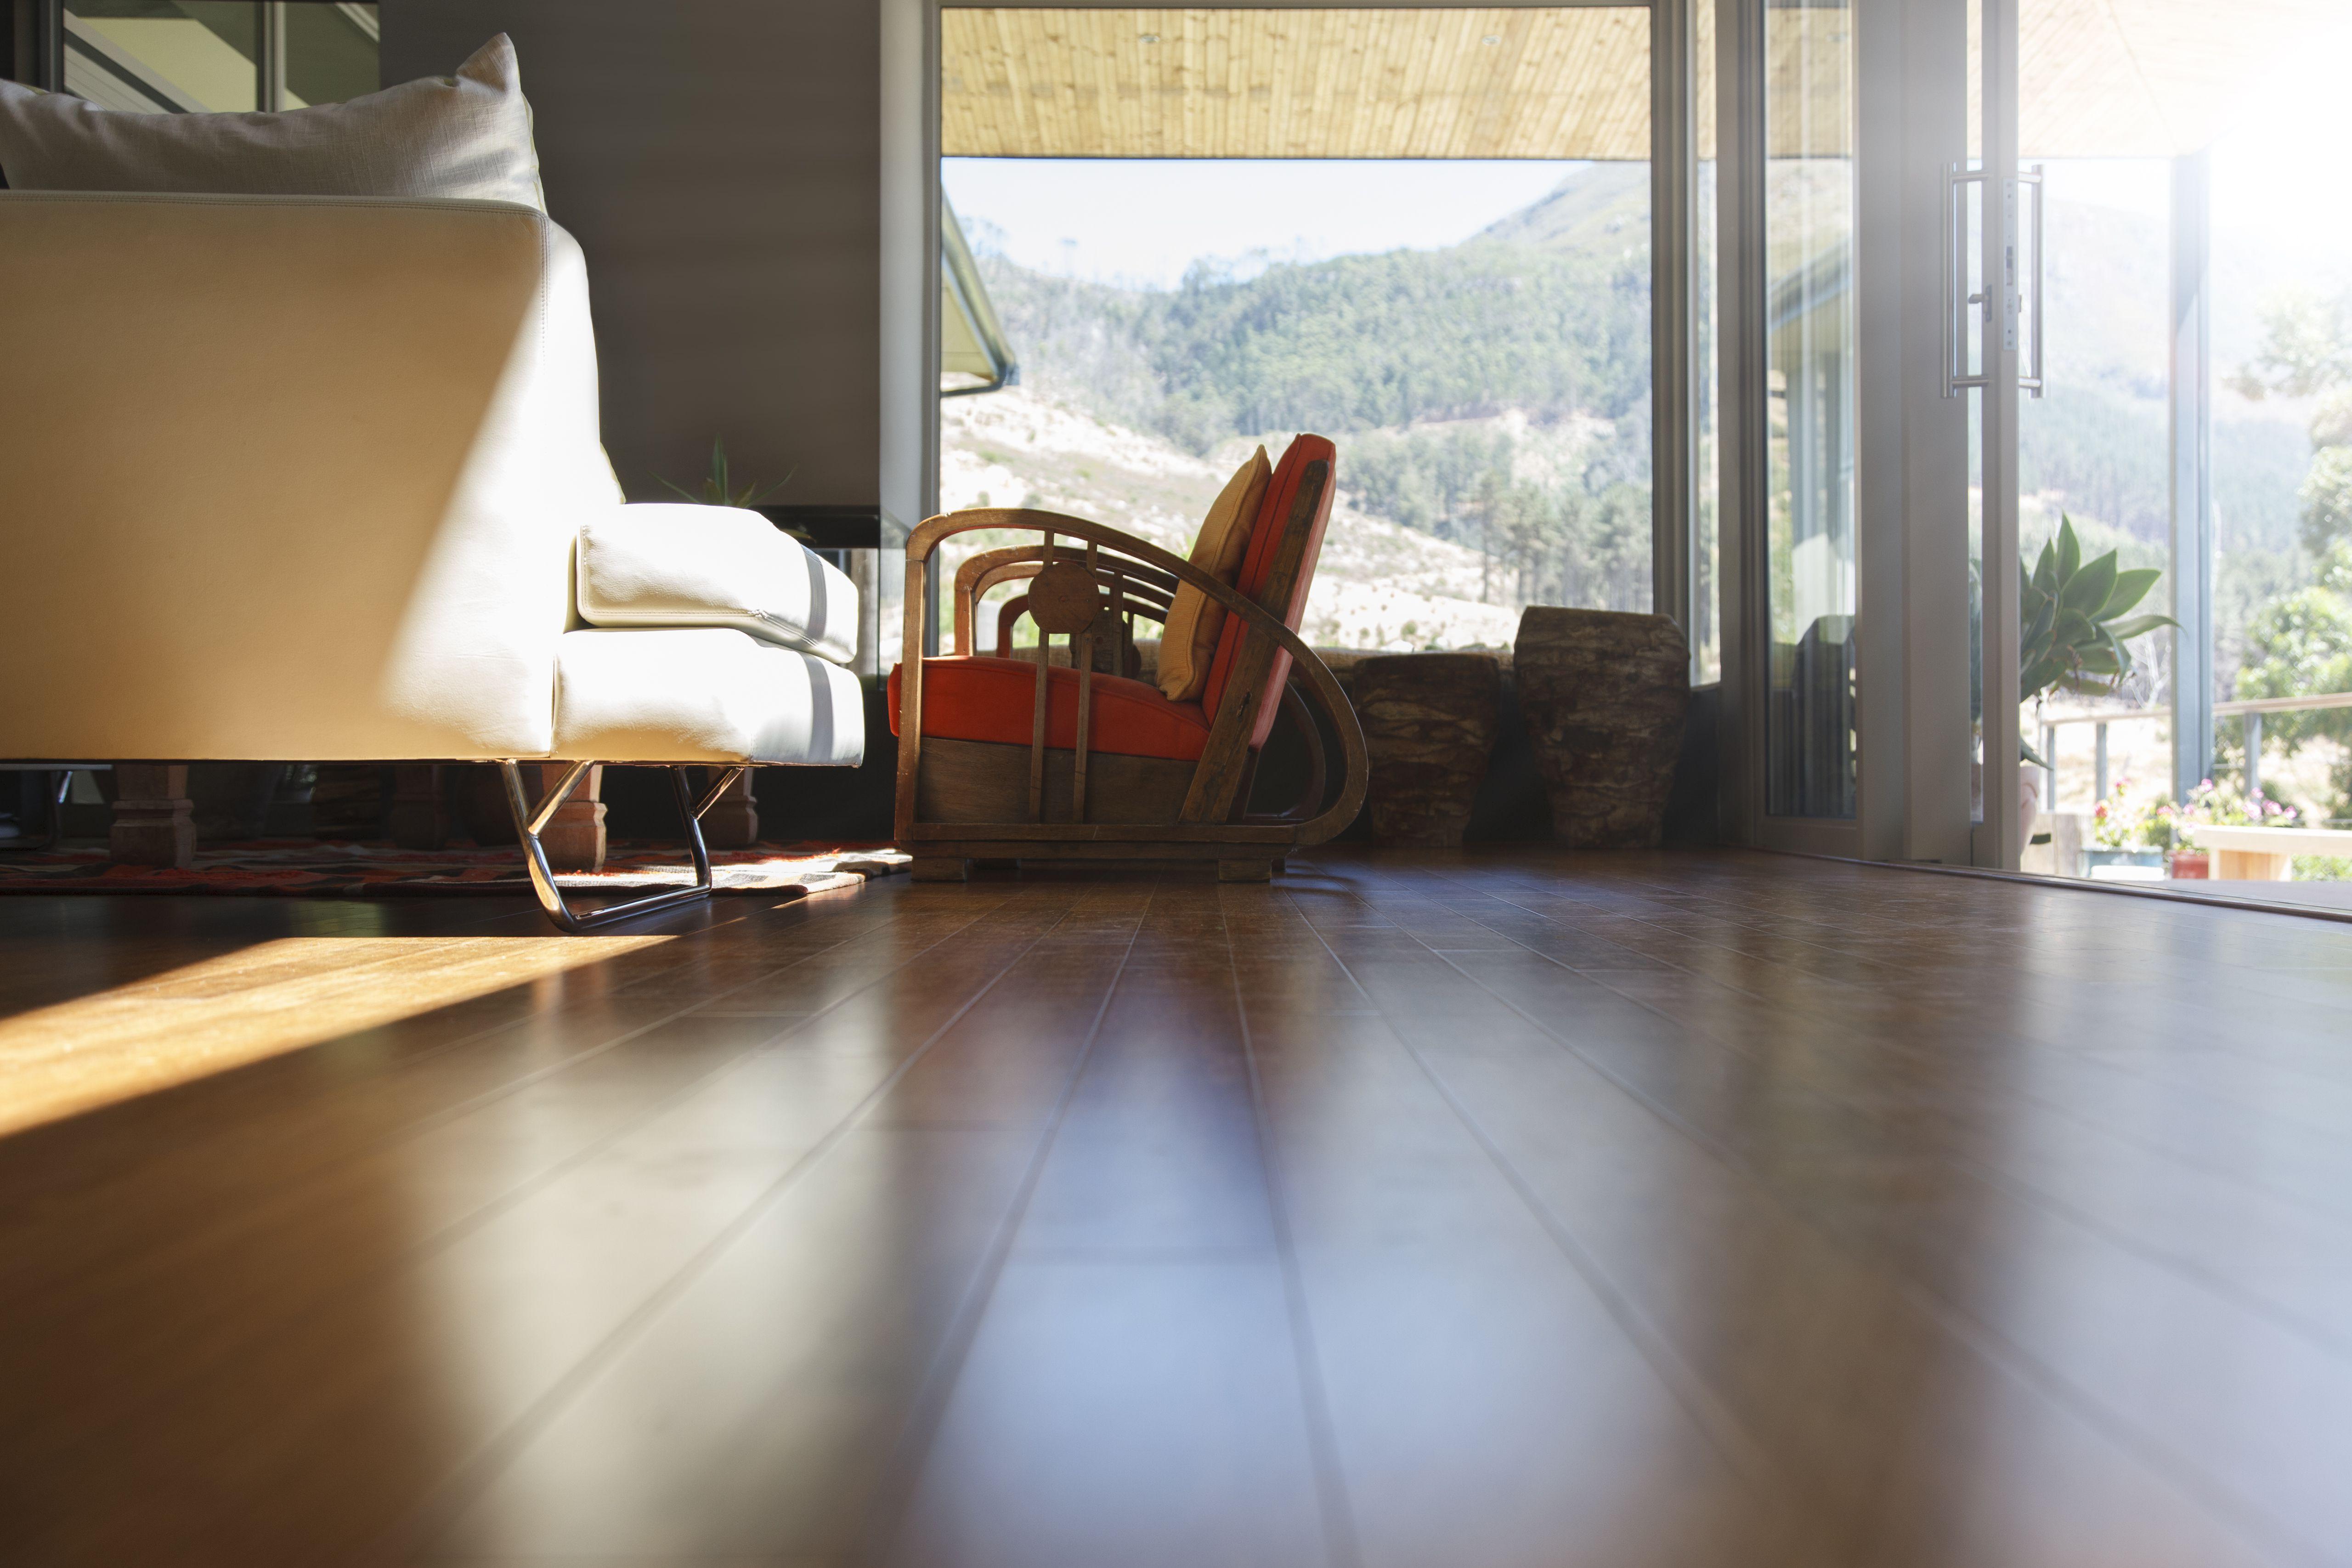 hardwood floor refinishing little rock of a vinyl plank flooring guide regarding living room interior hard wood floor and sofa 525439899 57e95e215f9b586c359d5ab1